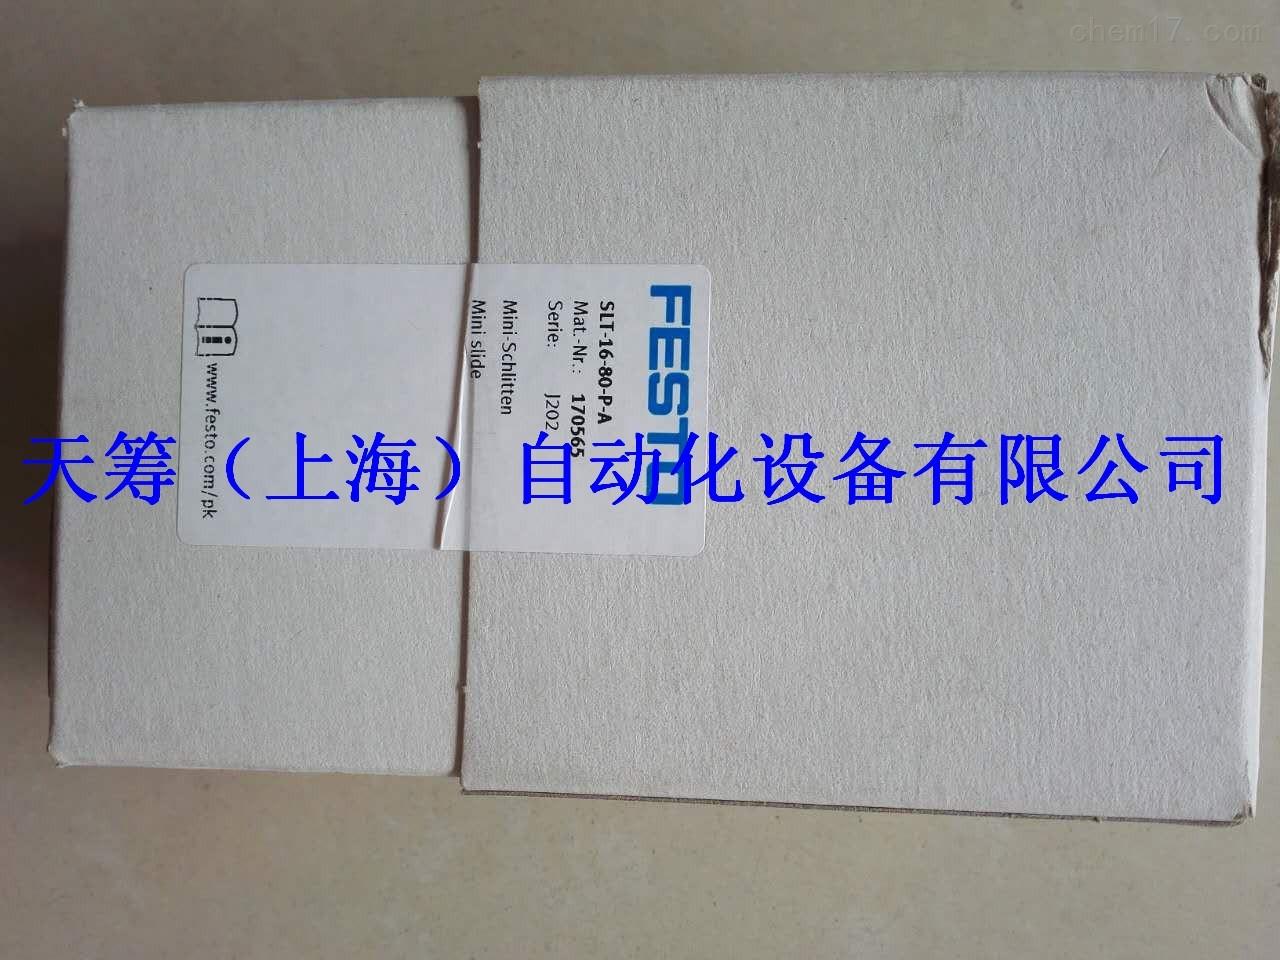 FESTO小型滑块驱动器SLT-16-80-P-A